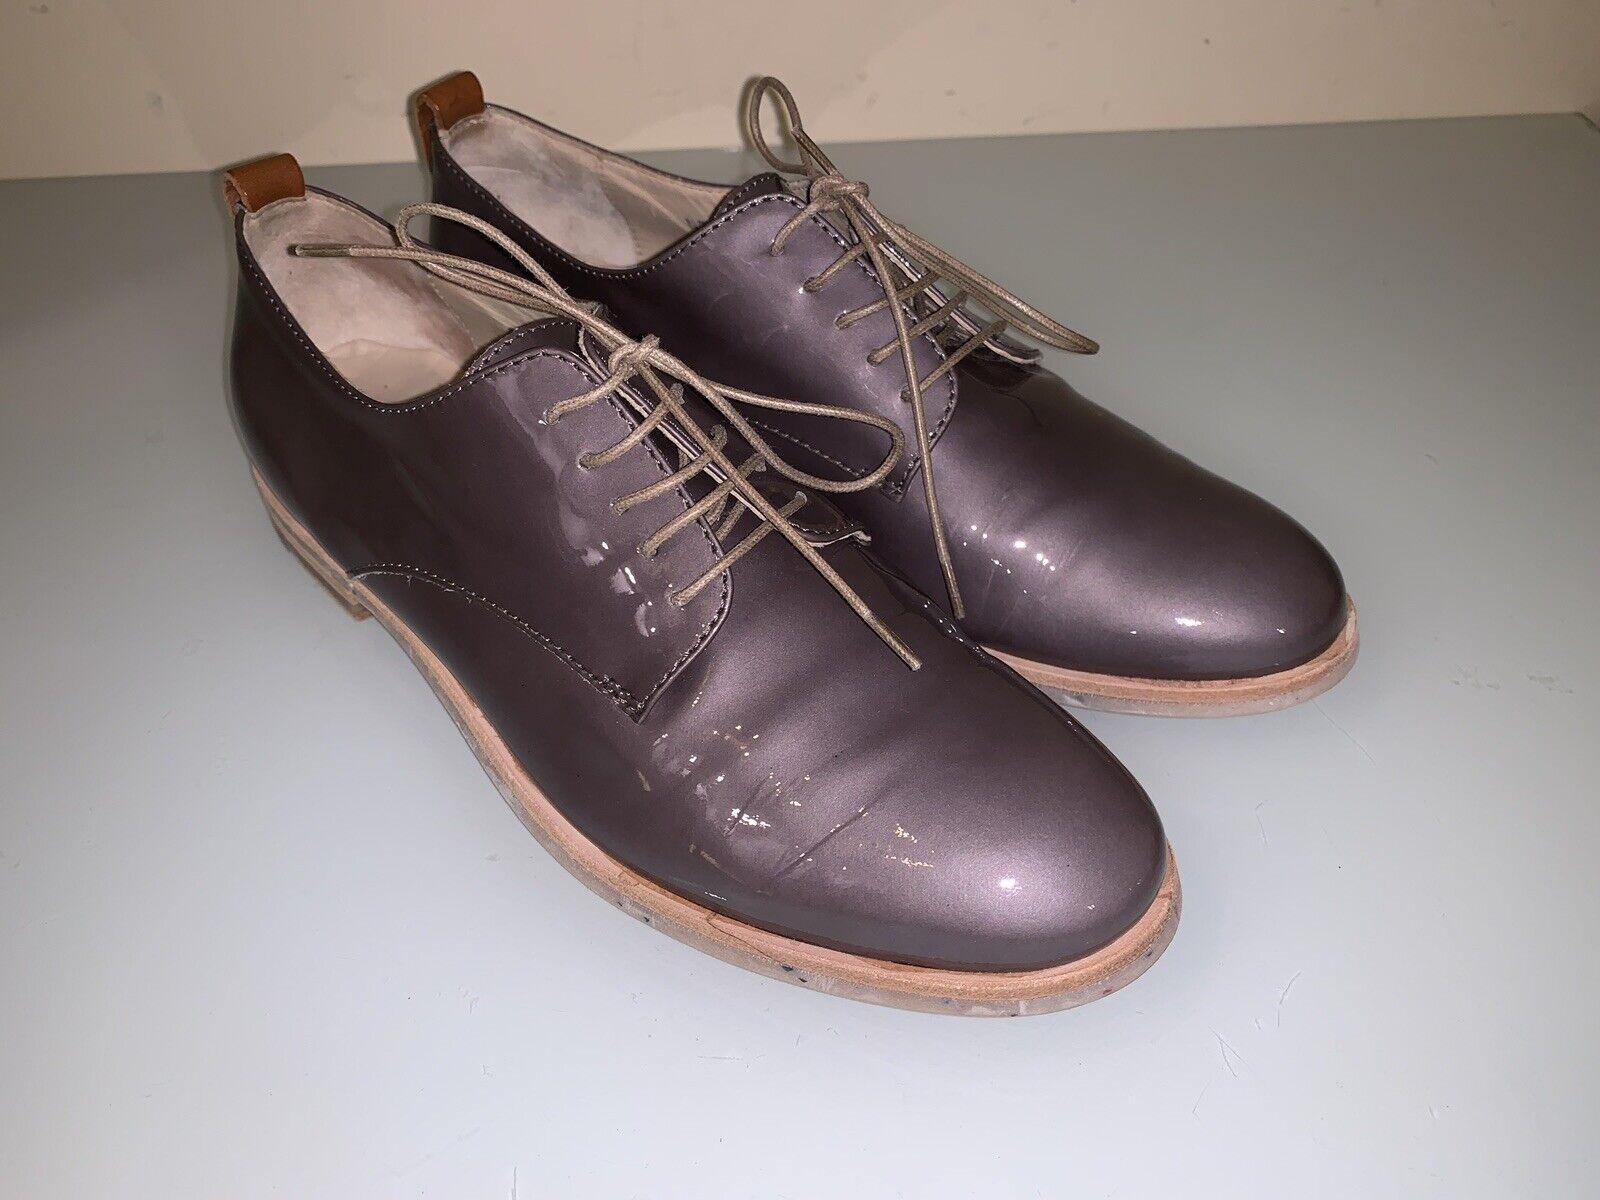 AGL Attilio Giusti Leombcorrerei sautope Sz 36.5(US 6) Wouomo Oxford Leather Lace Up